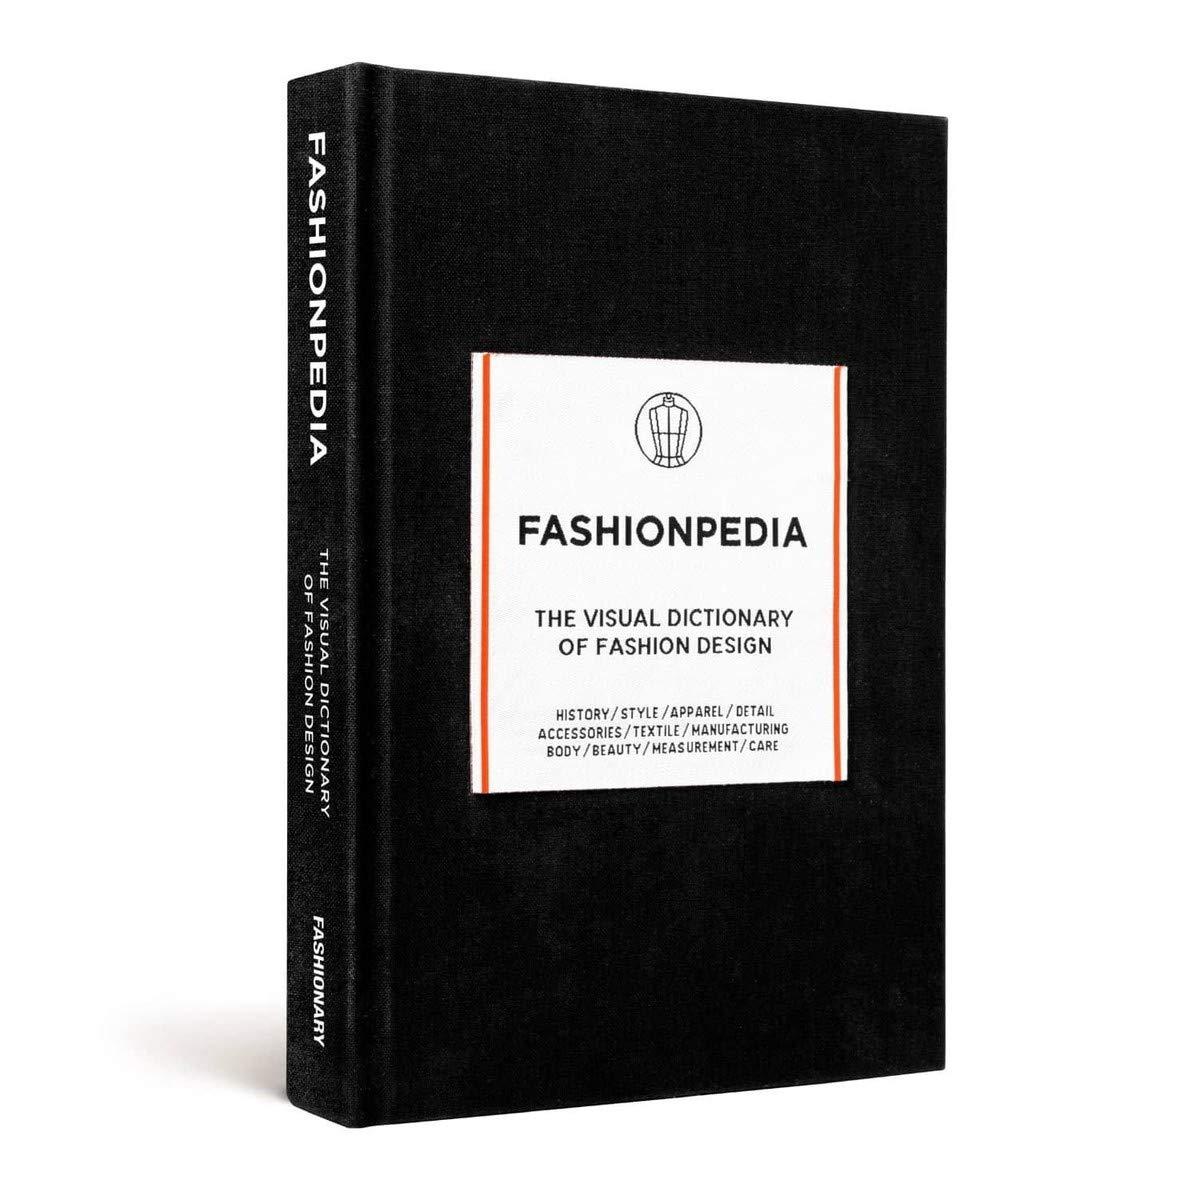 book for fashion interested, book for interior table book unique gift ideas amazon